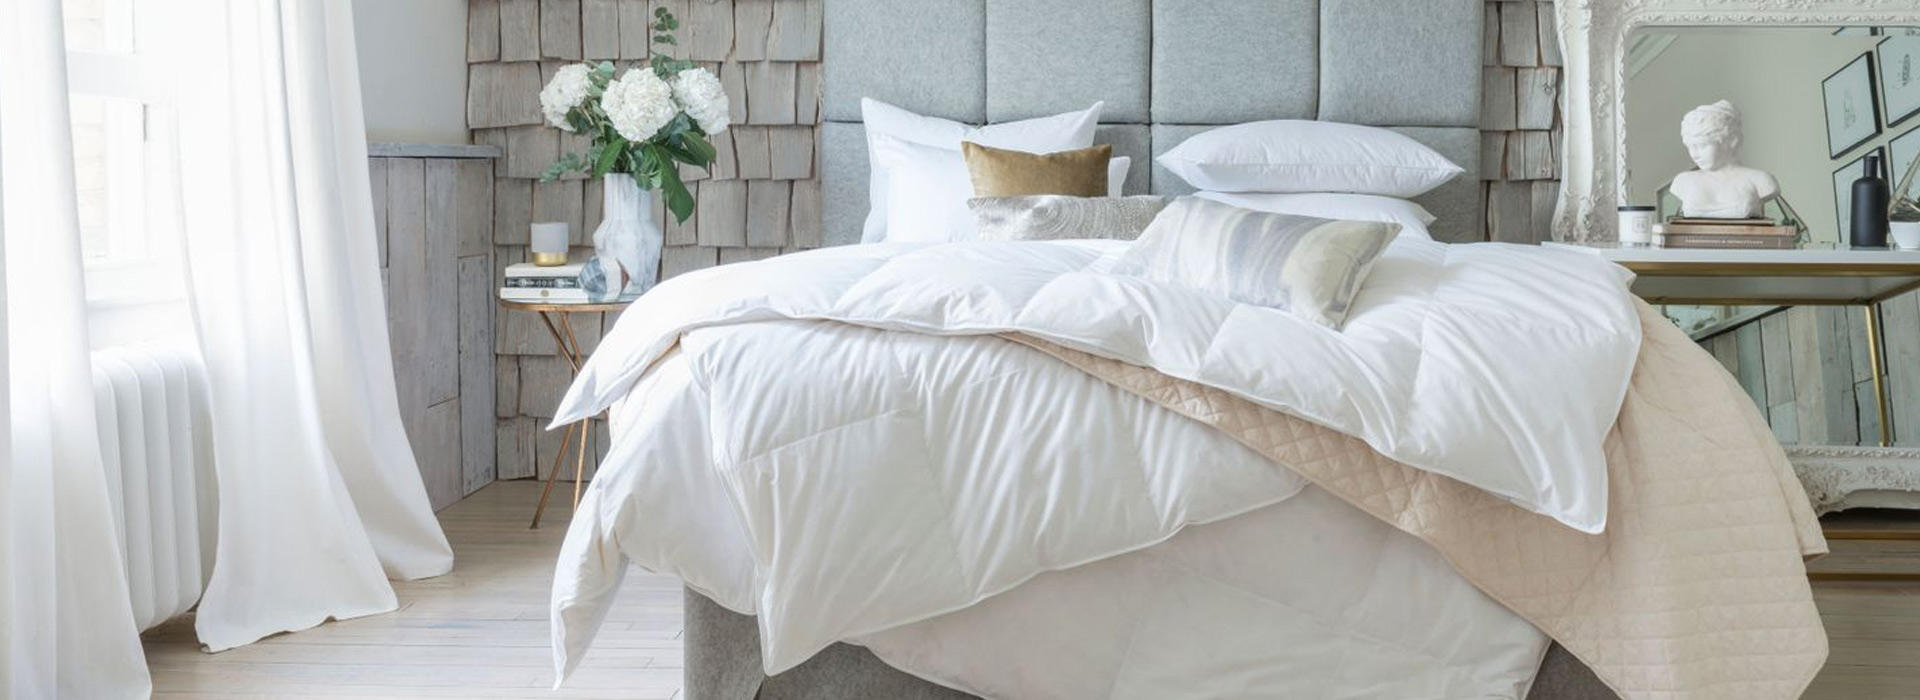 Bedding Buying Guides